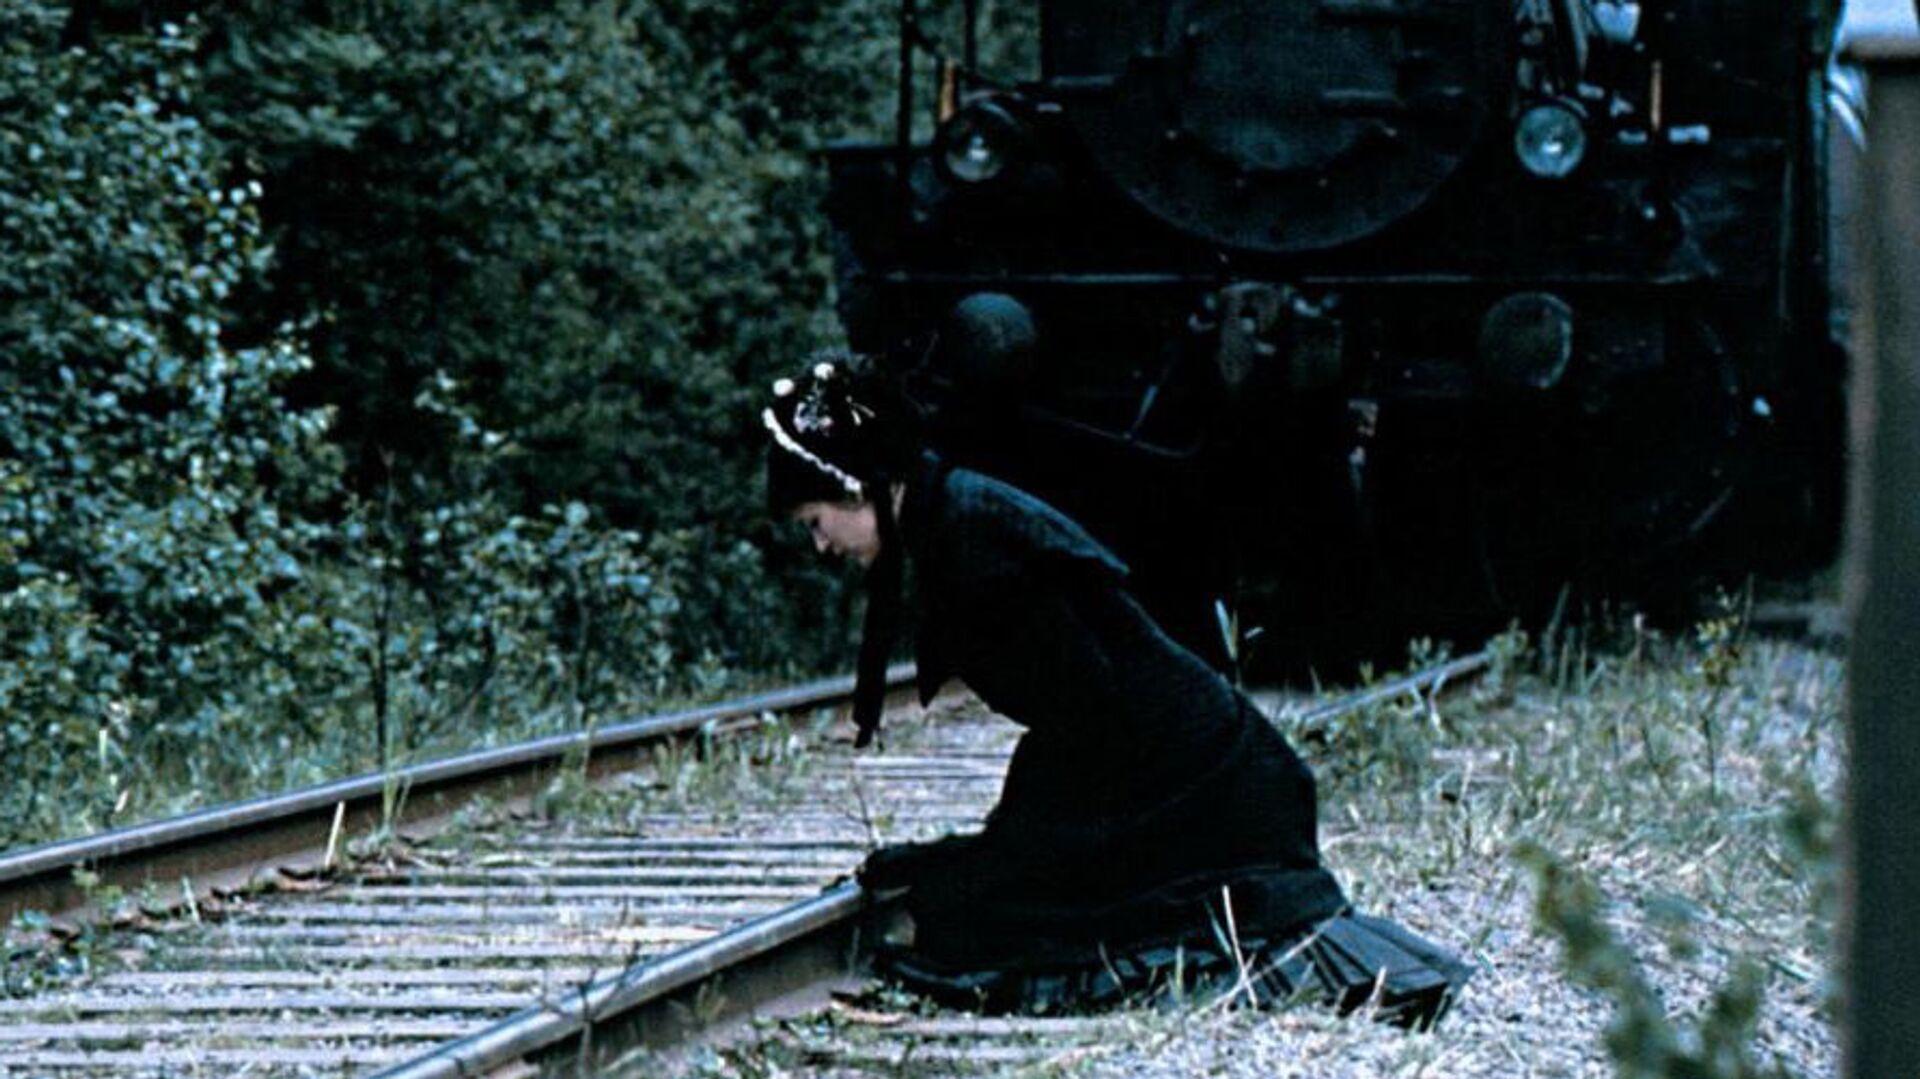 Кадр из фильма Анна Каренина - РИА Новости, 1920, 29.03.2021